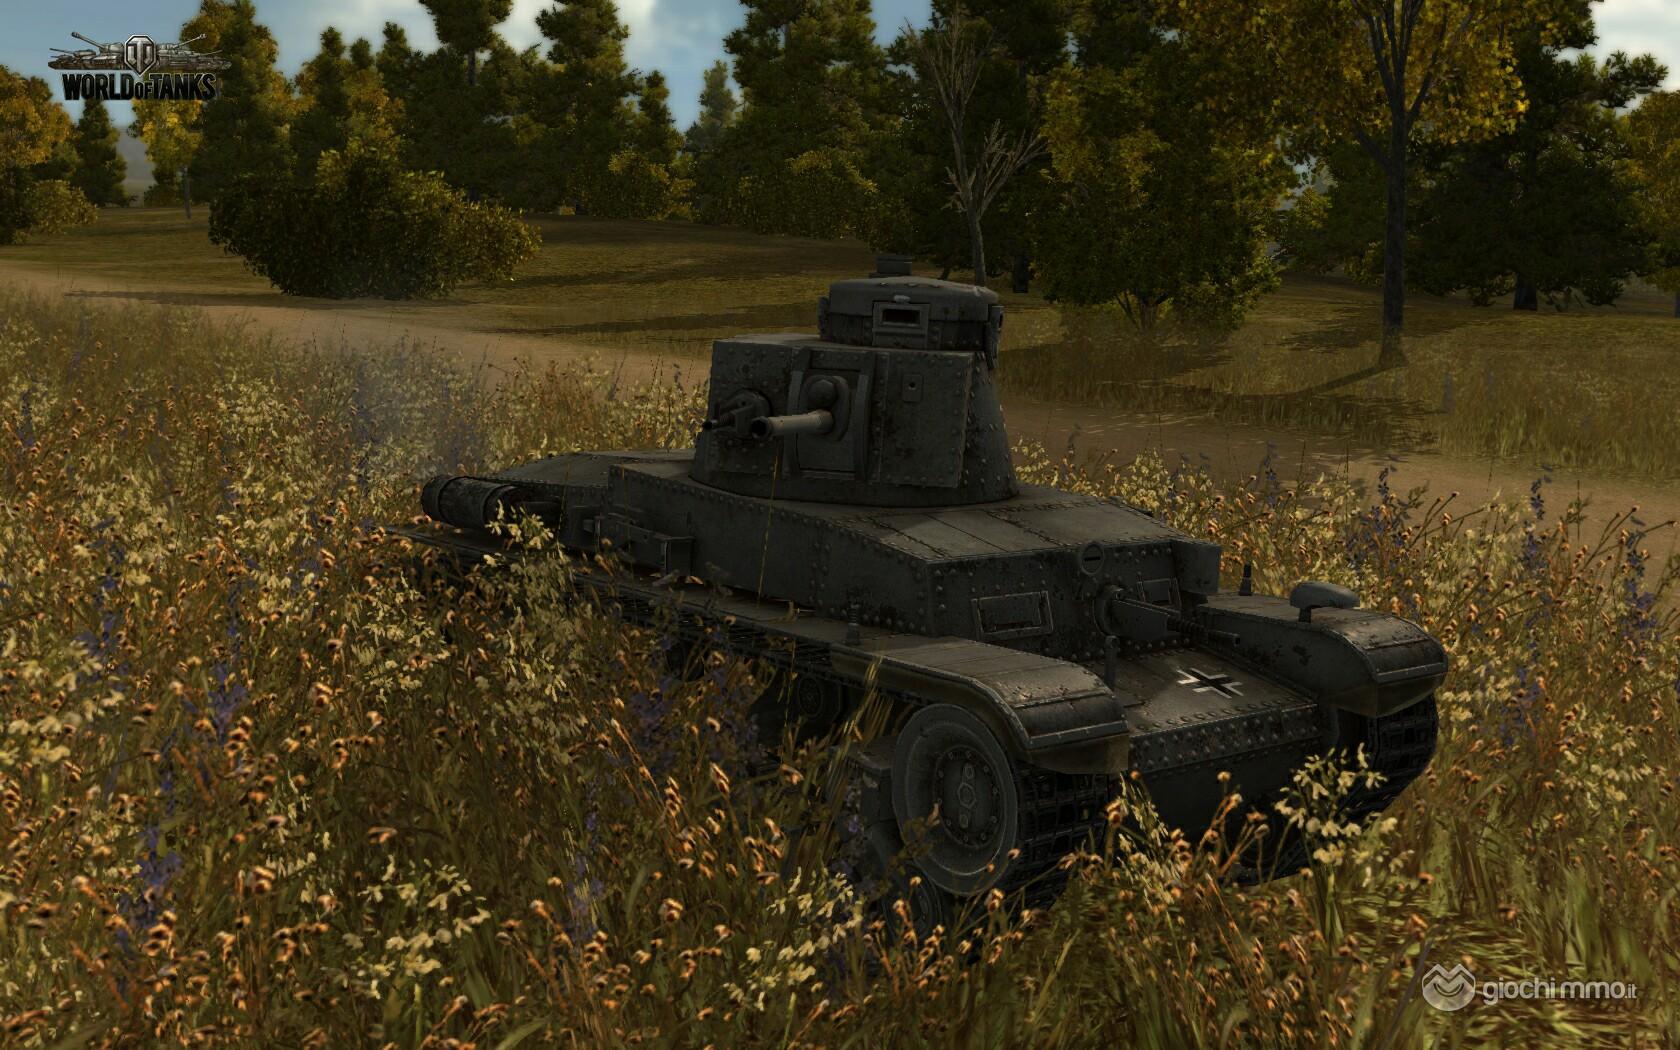 Clicca sull'immagine per ingrandirlaNome:   World of Tanks screen2.jpgVisite: 96Dimensione:   546.9 KBID: 8203